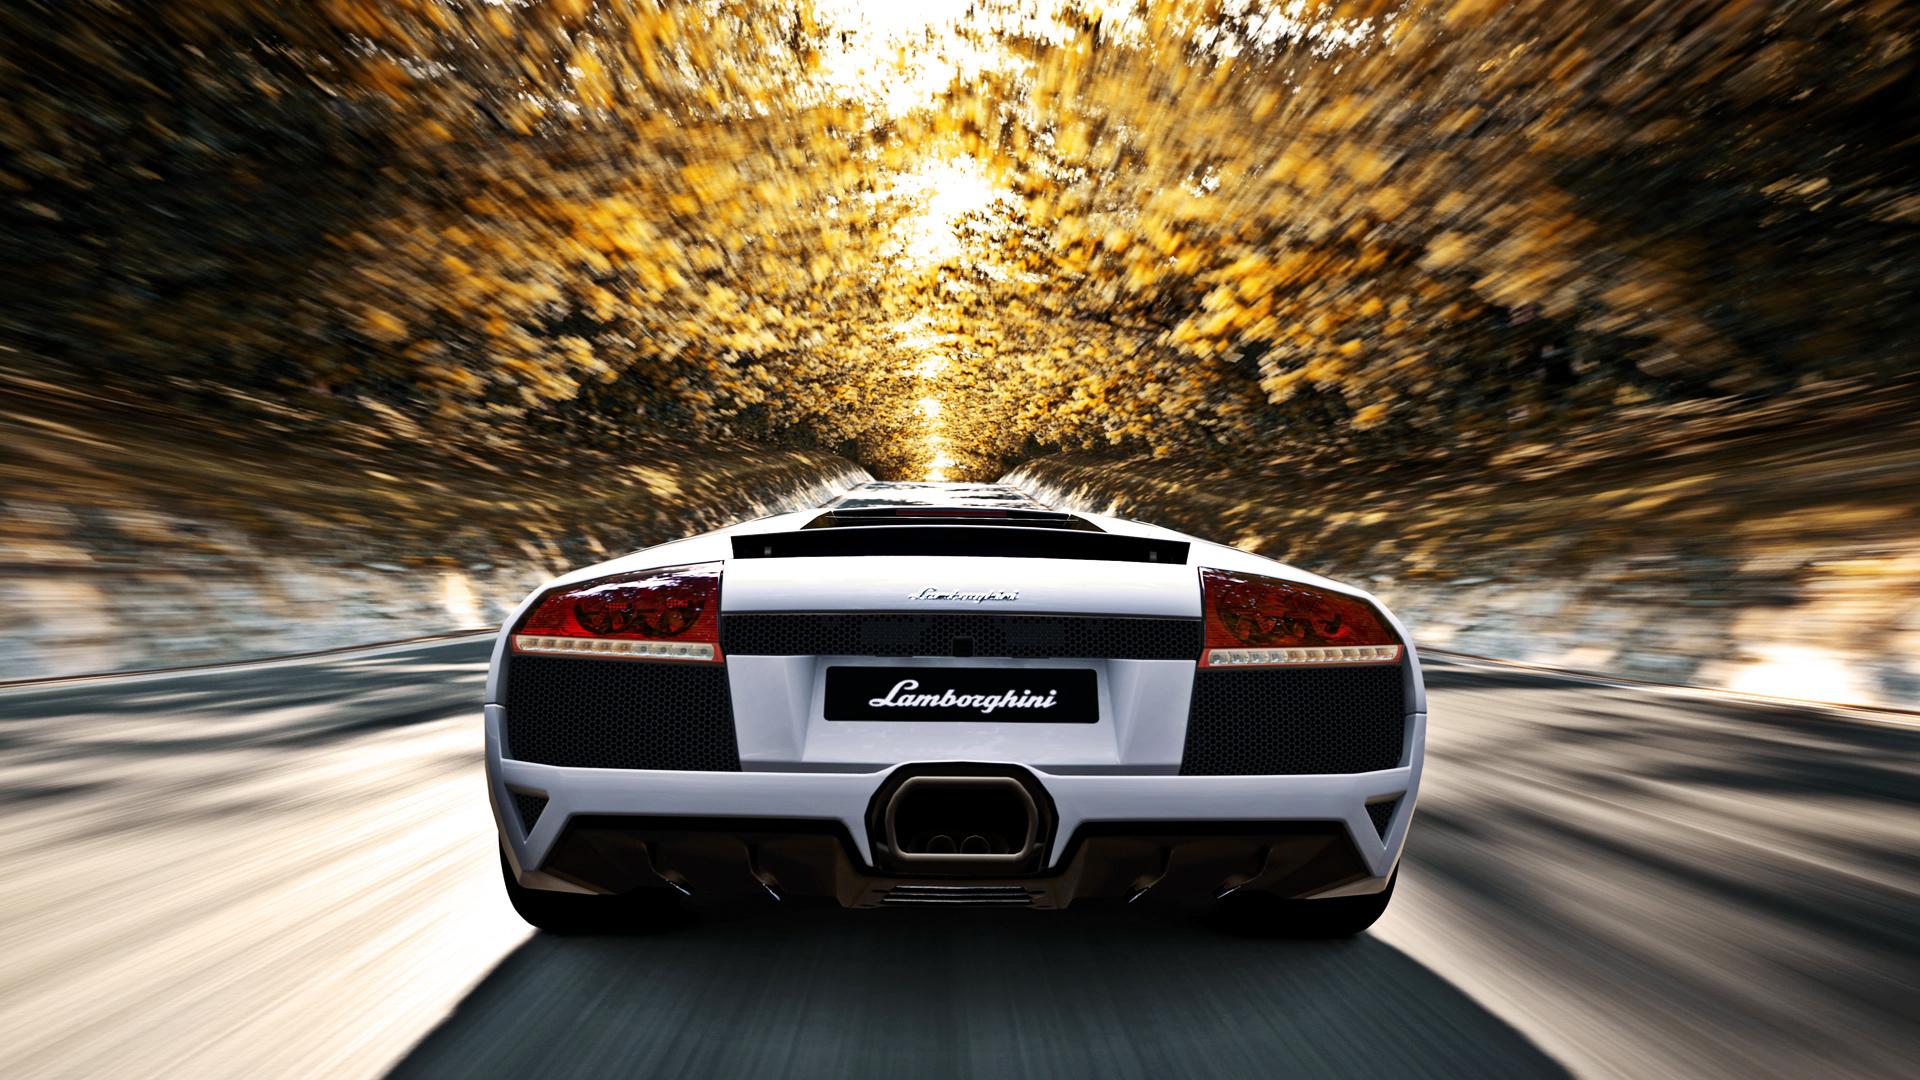 Lamborghini Wallpaper Hd Sf Wallpaper